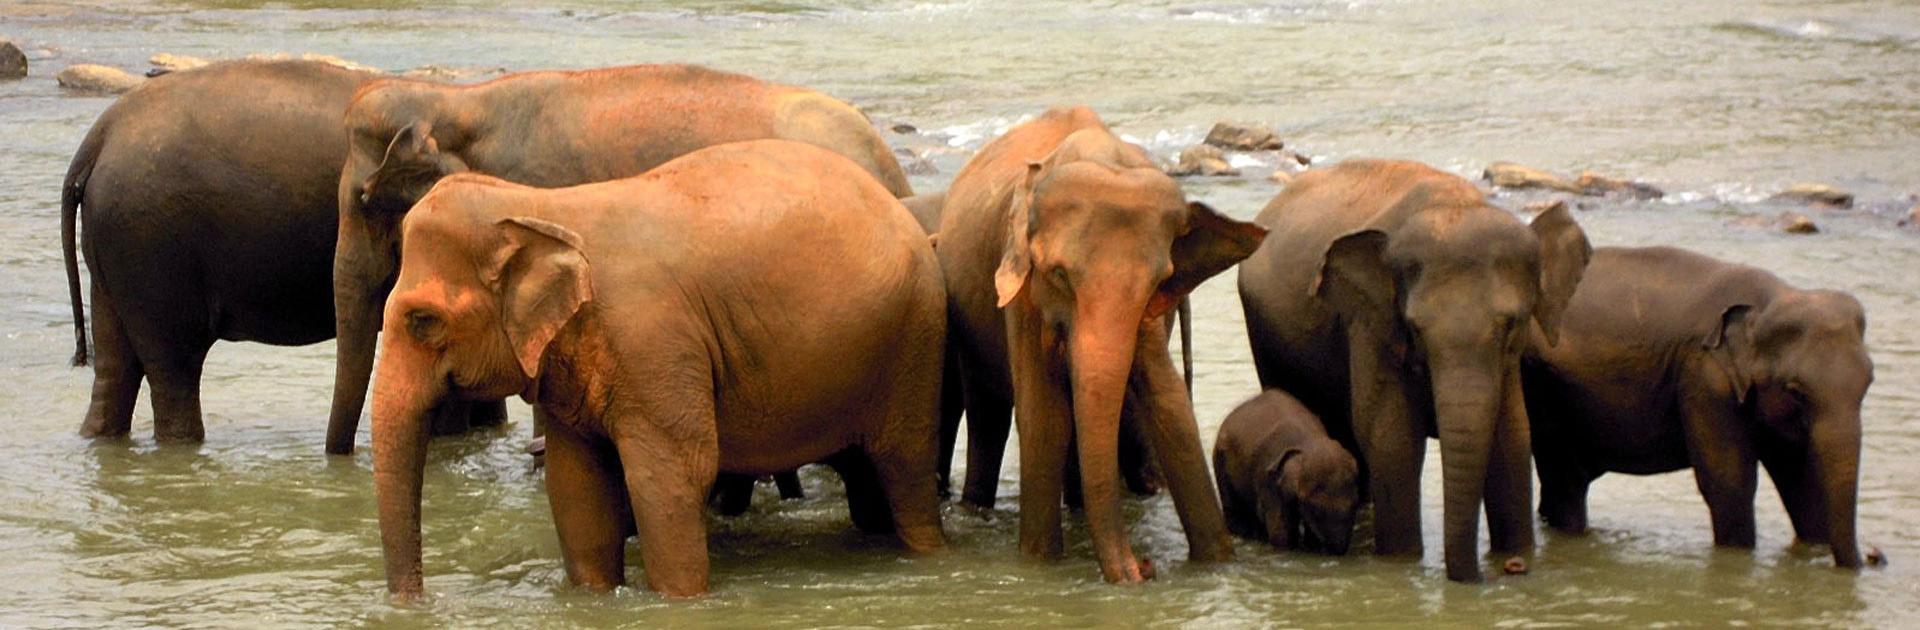 LK Sri Lanka Imprescindible con playas Passikudah o Tricomale10 días 2